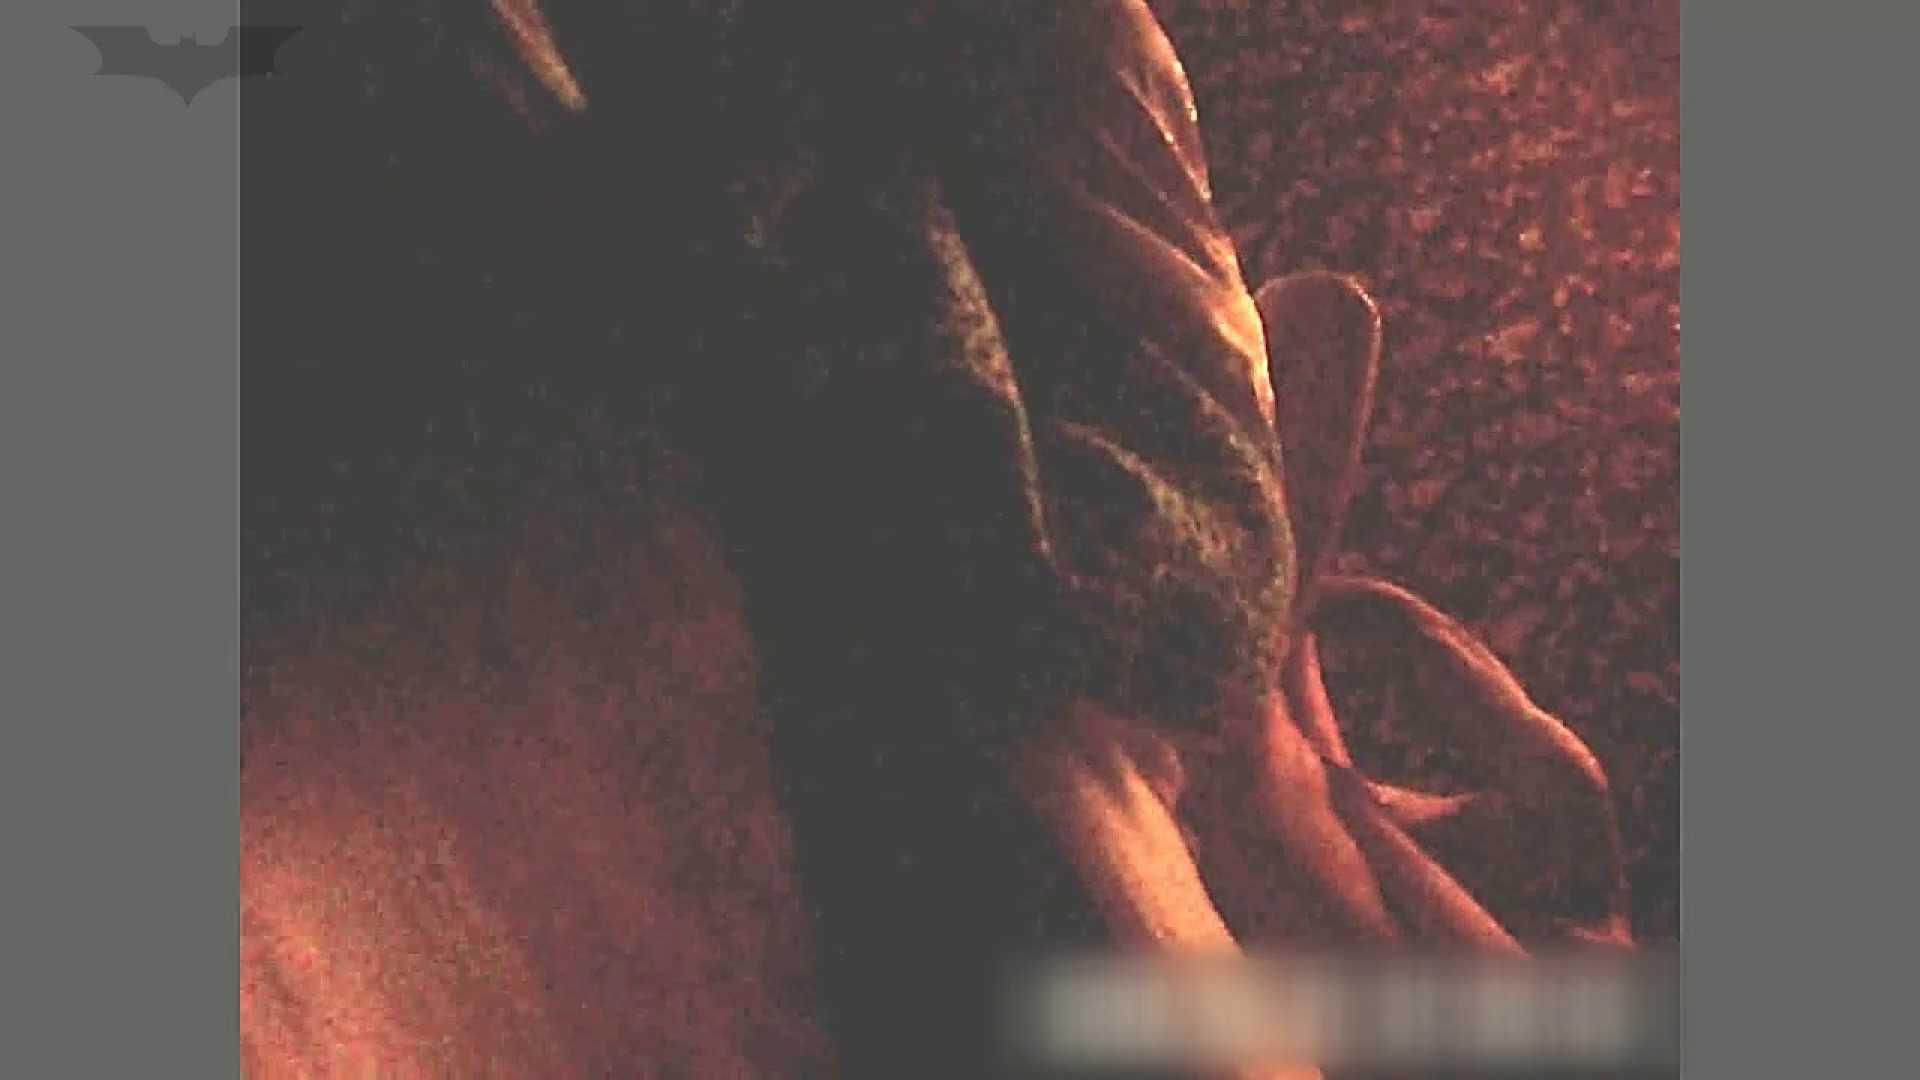 ▲2017_05位▲ 学園アイドル美人女子大生!❶4人厳選詰合せVol.49 人気作   女子大生  113画像 51